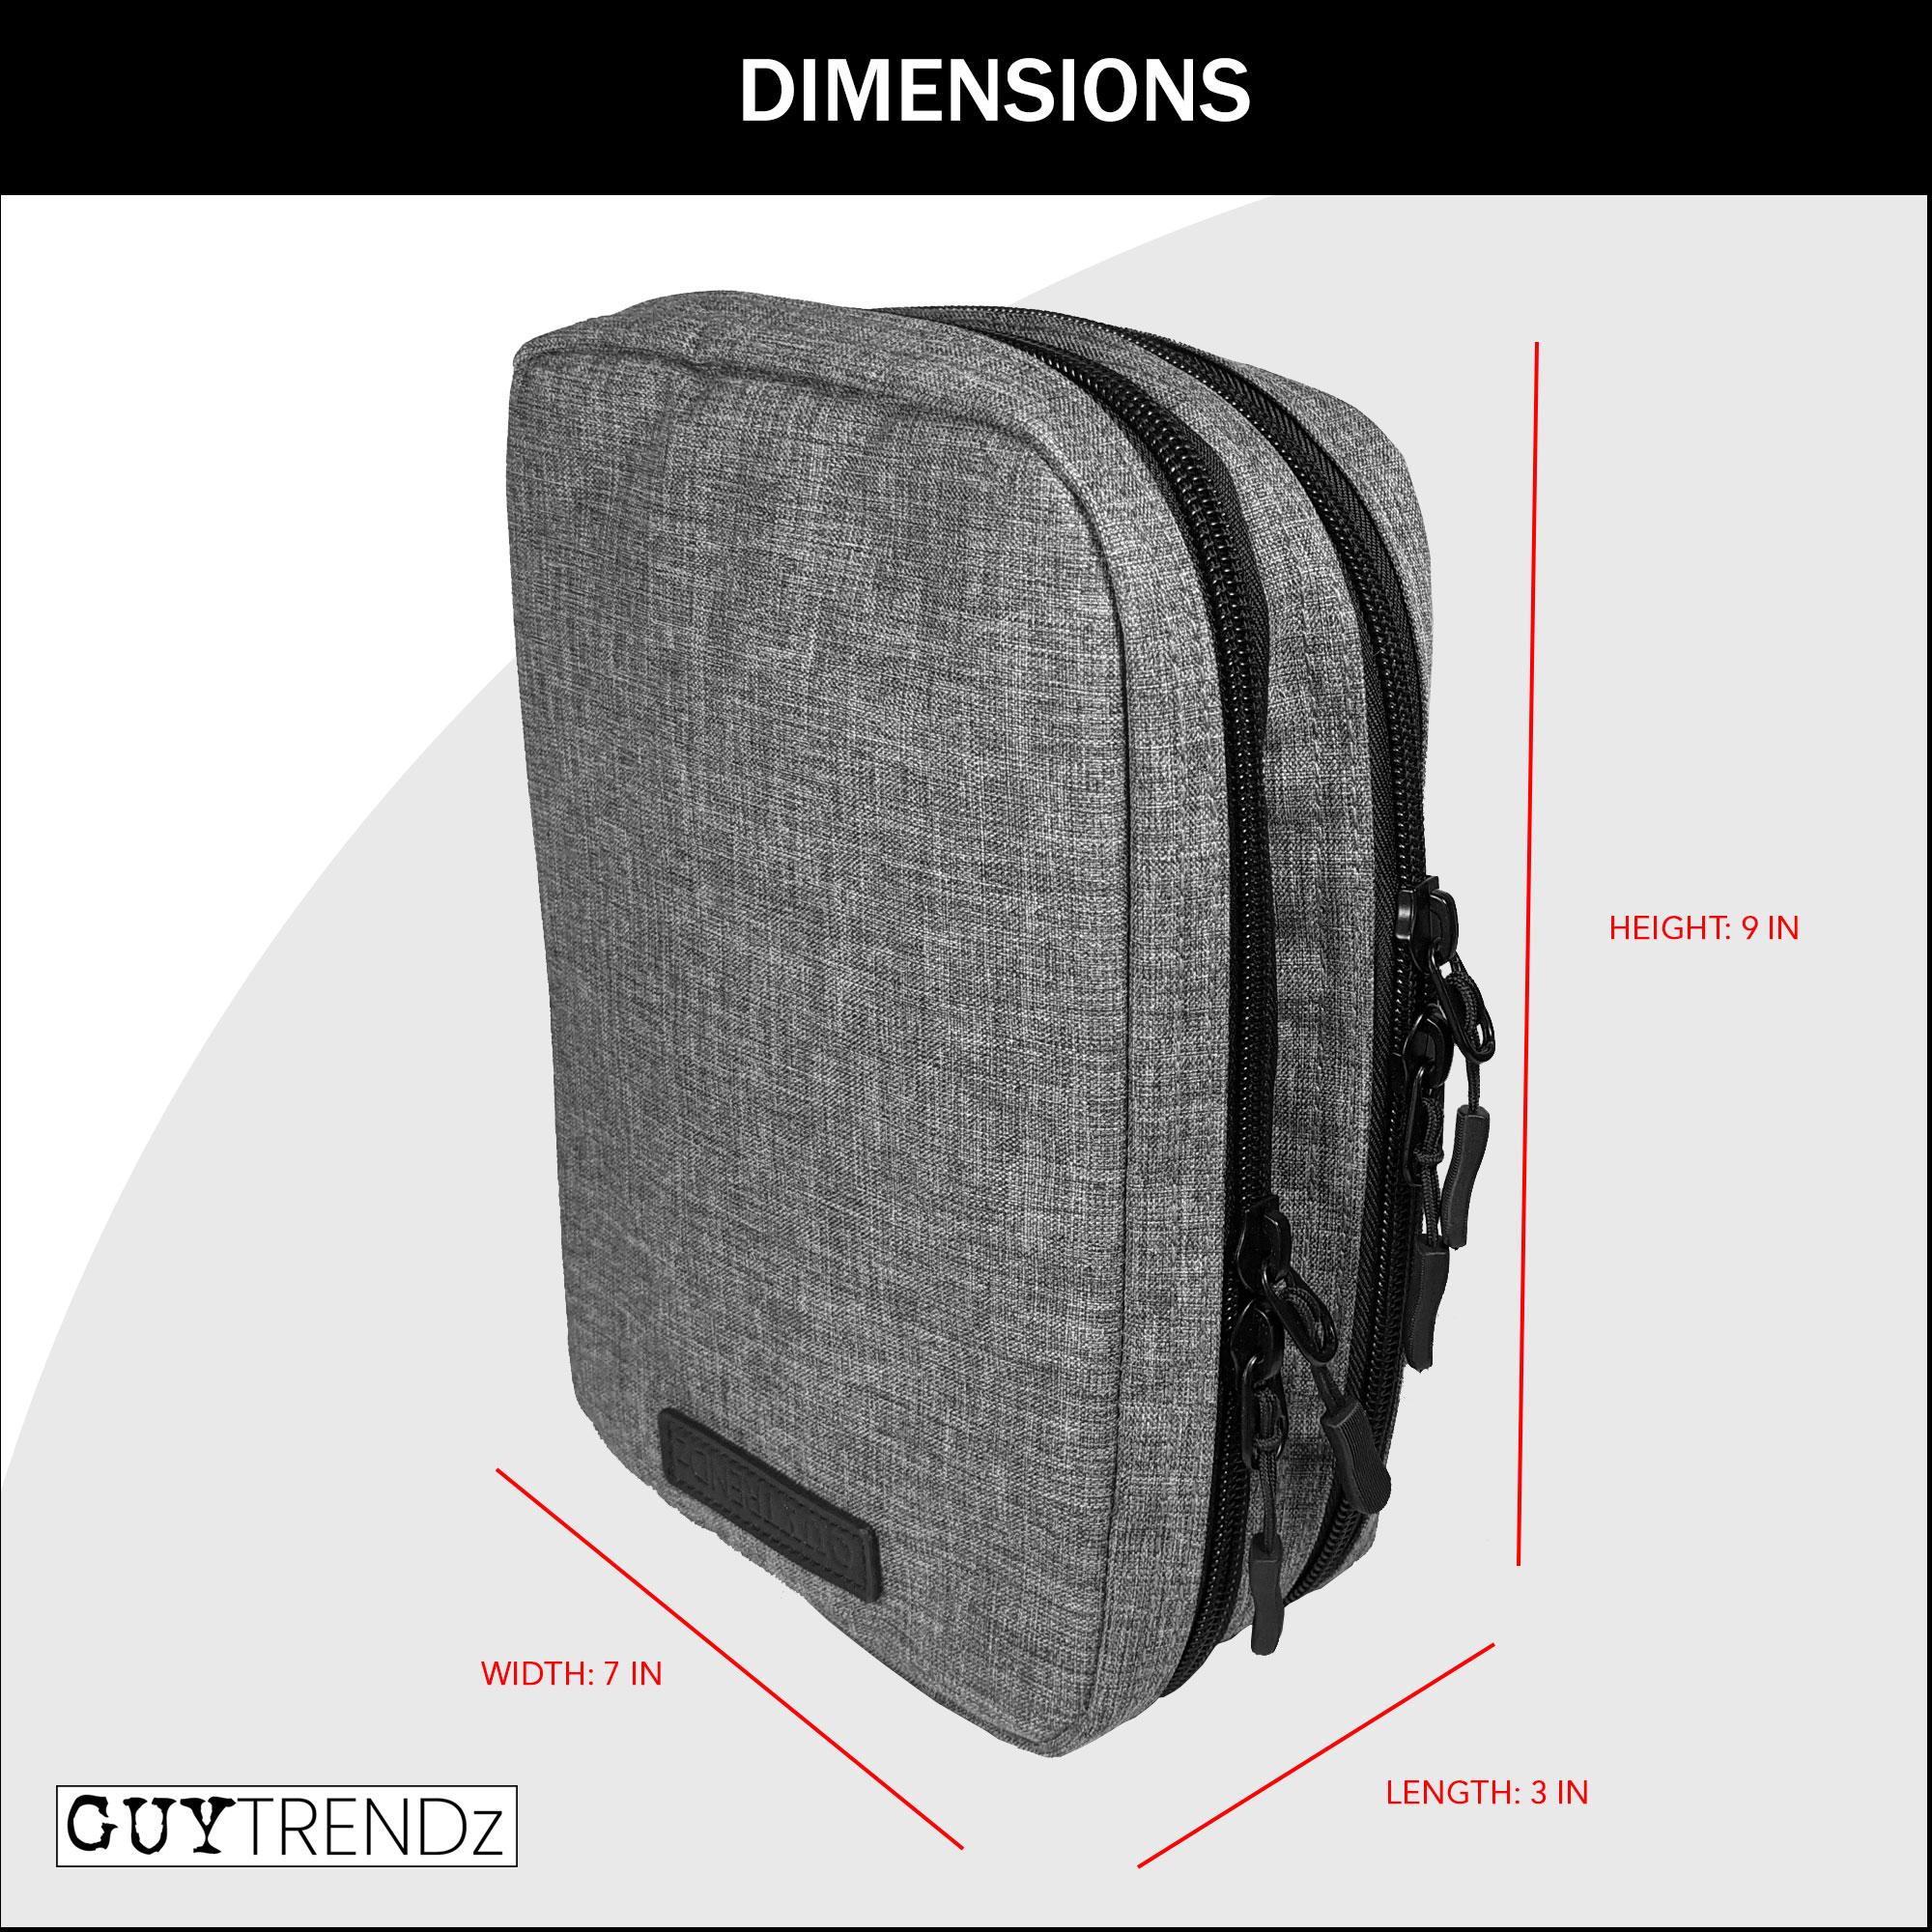 21 09 17 16 40 29 original b09fygb86s electronics bag dimensions